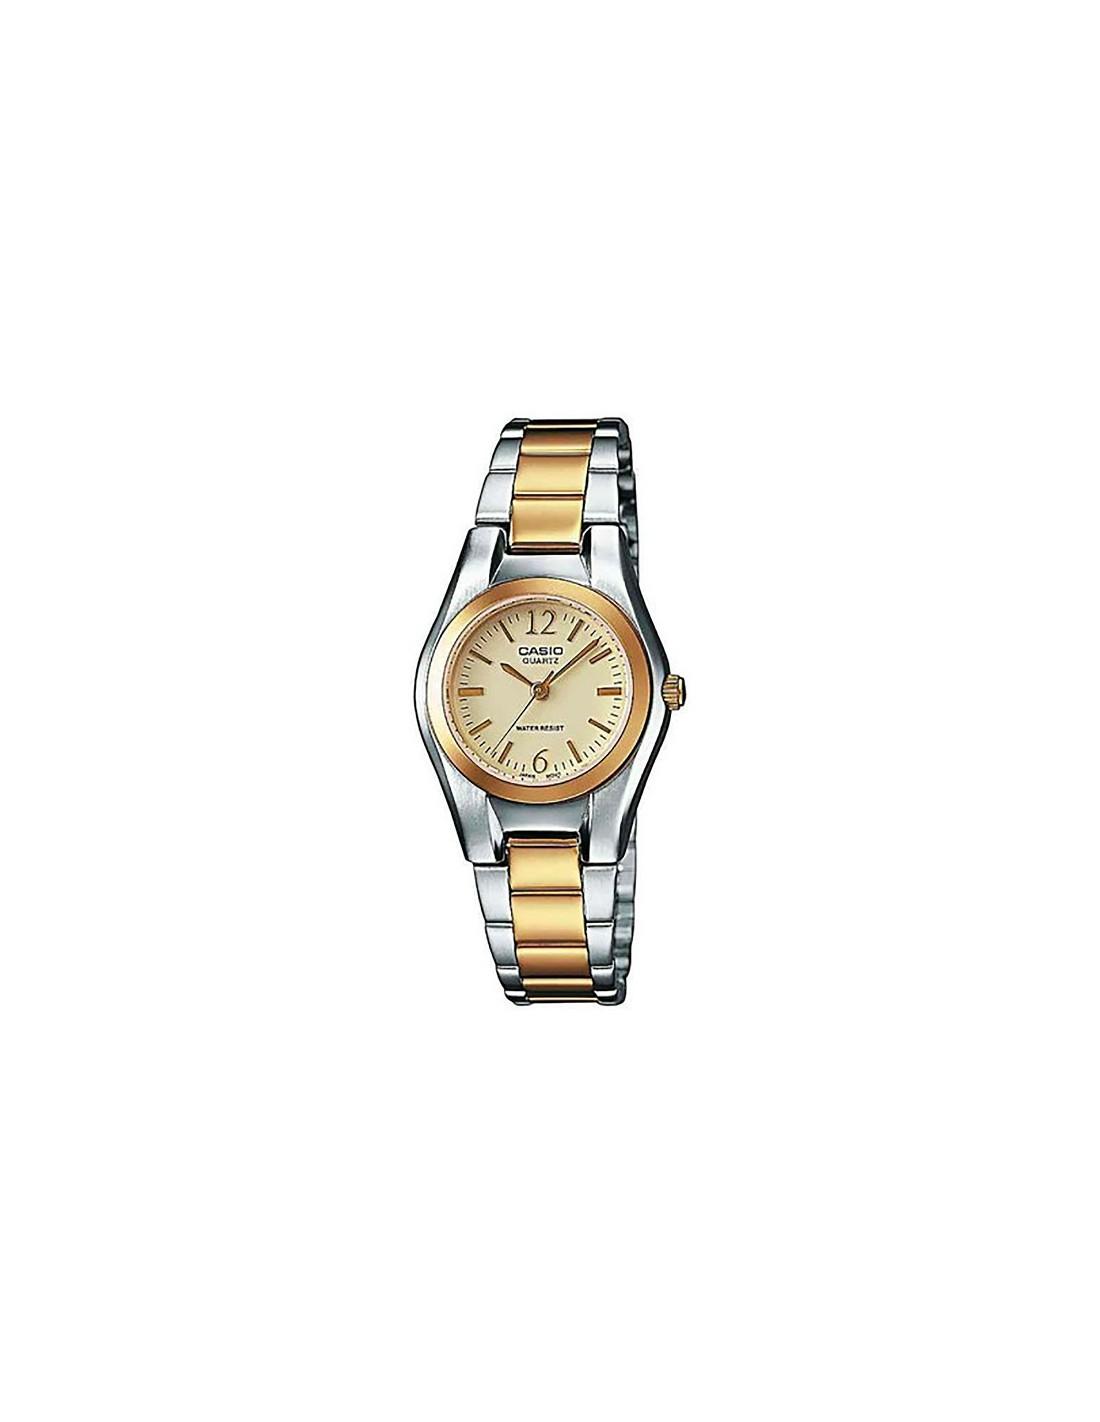 d06020718bca Reloj Mujer Casio Collection LTP-1280PSG-9AEF - Carex Joyeros